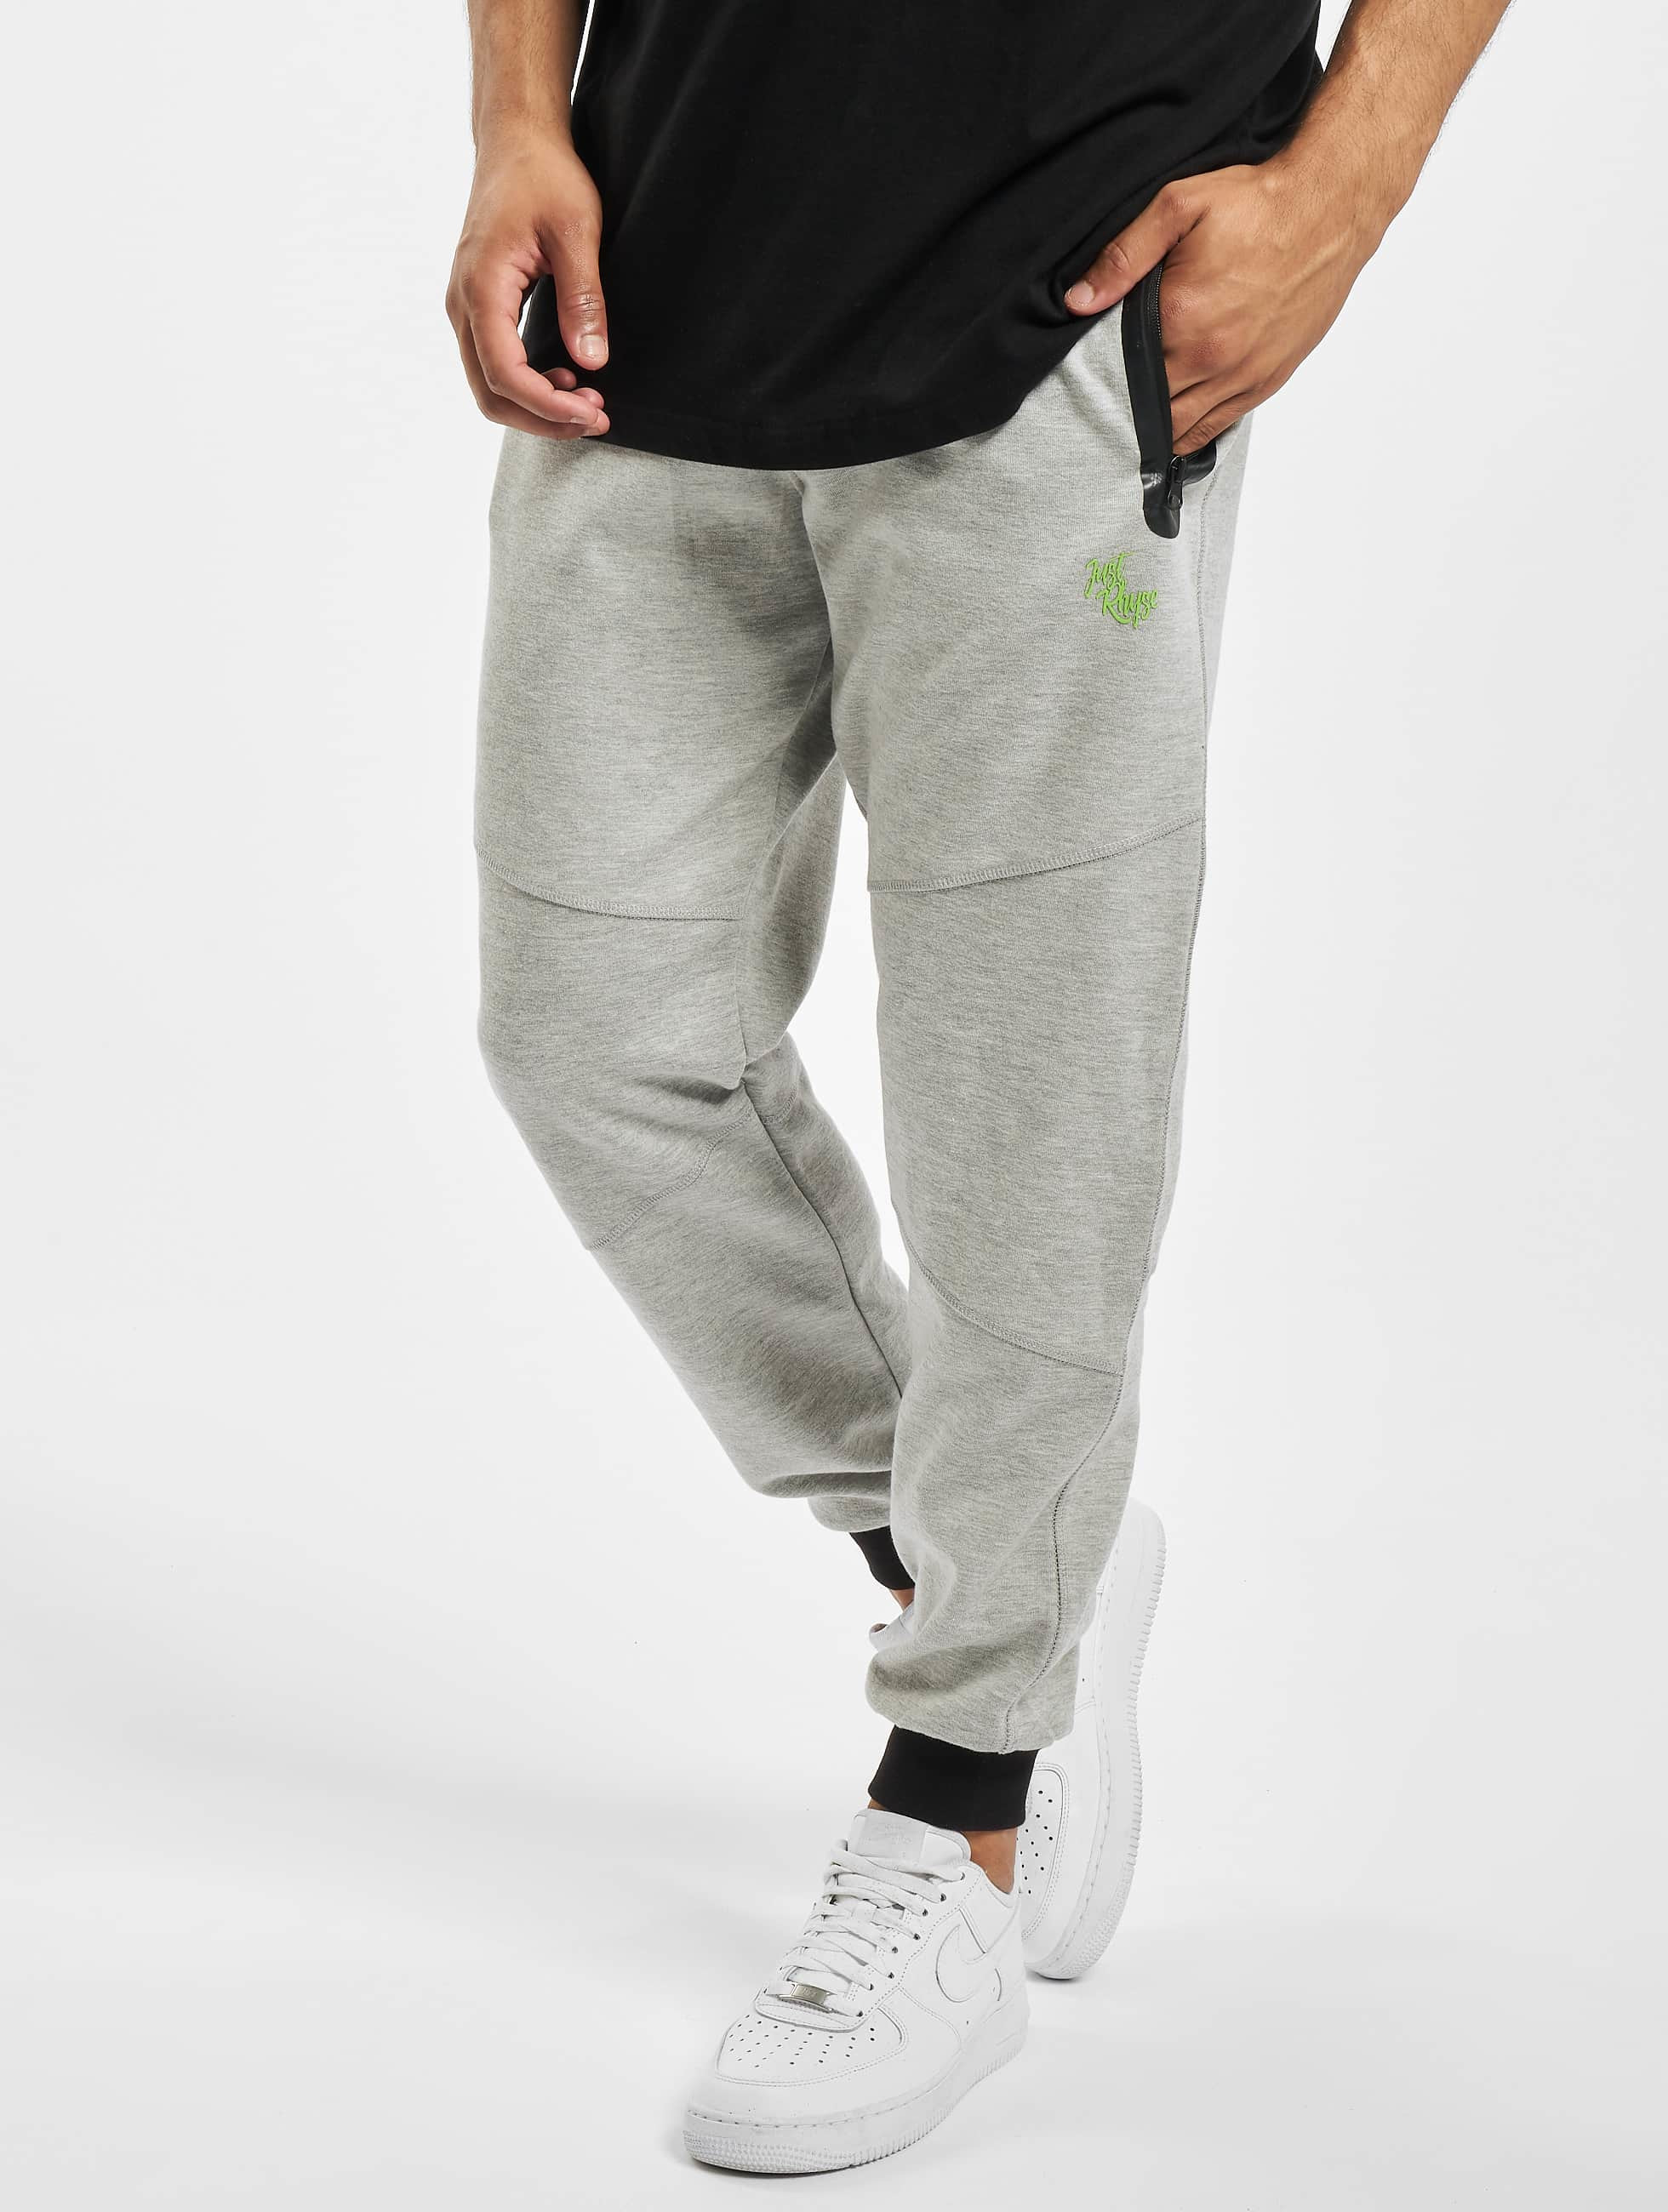 Just Rhyse / Sweat Pant Tront Peak in grey XL